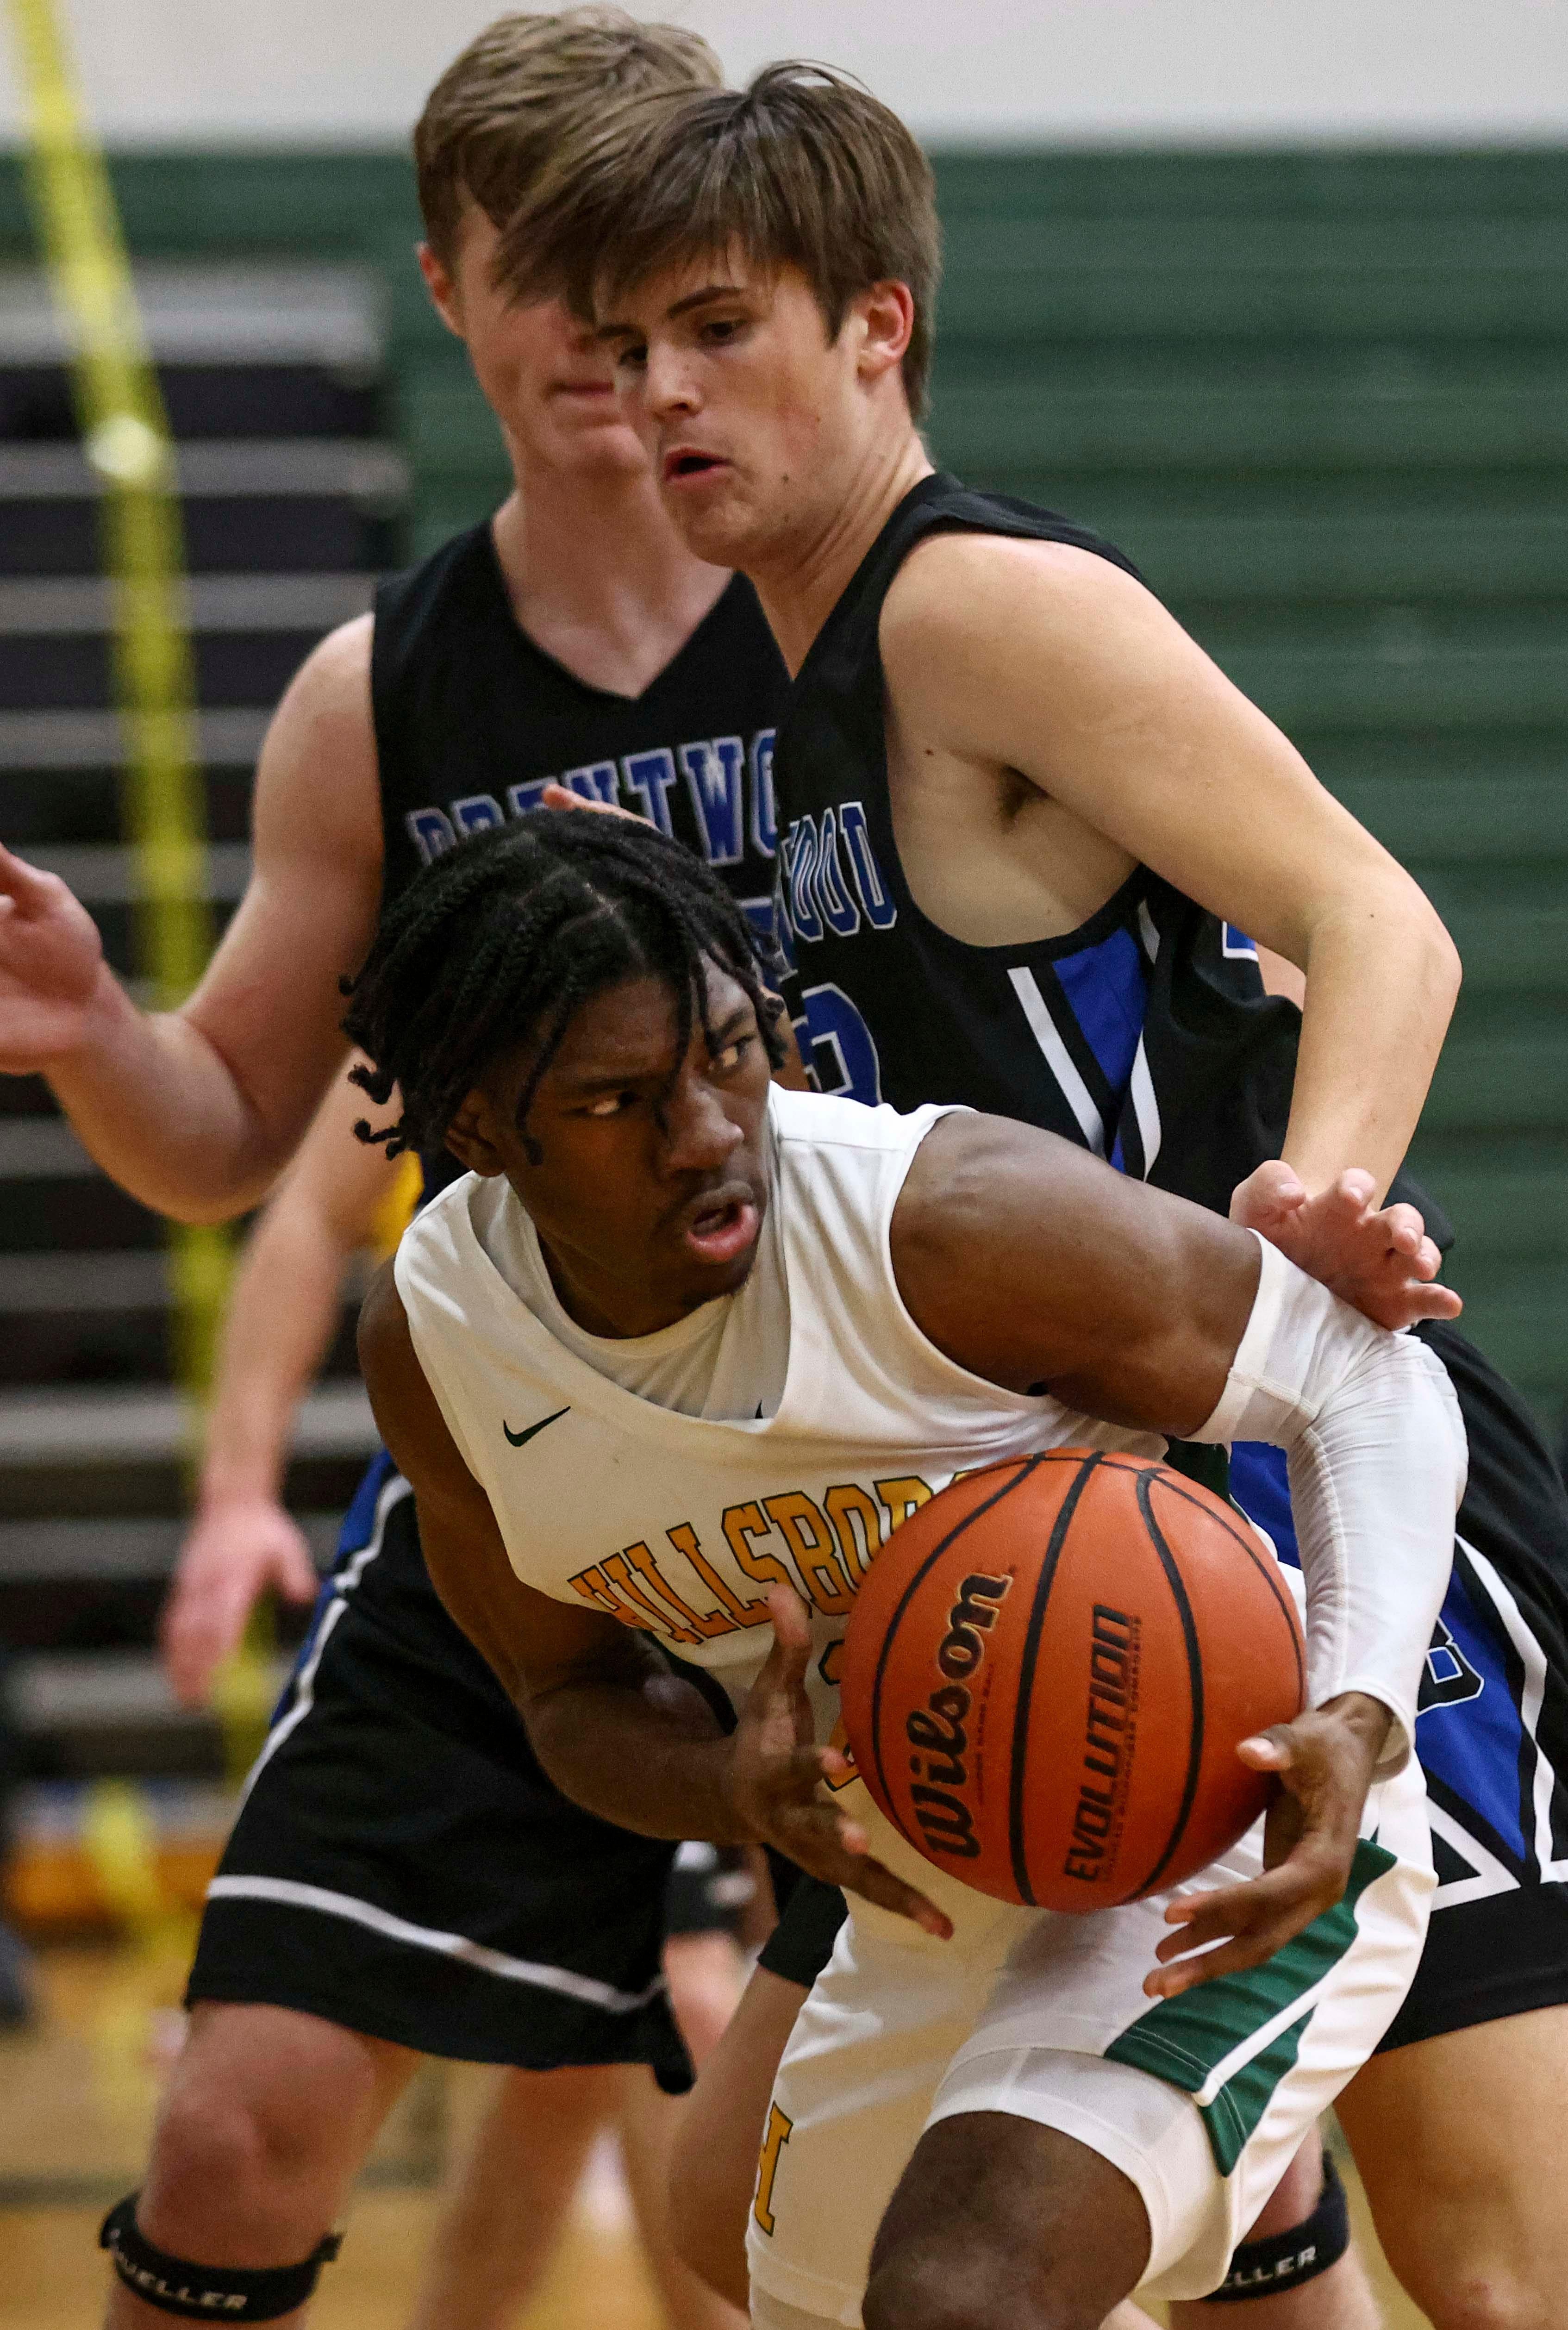 TSSAA Boys Basketball Highlights: Brentwood 51, Hillsboro 45